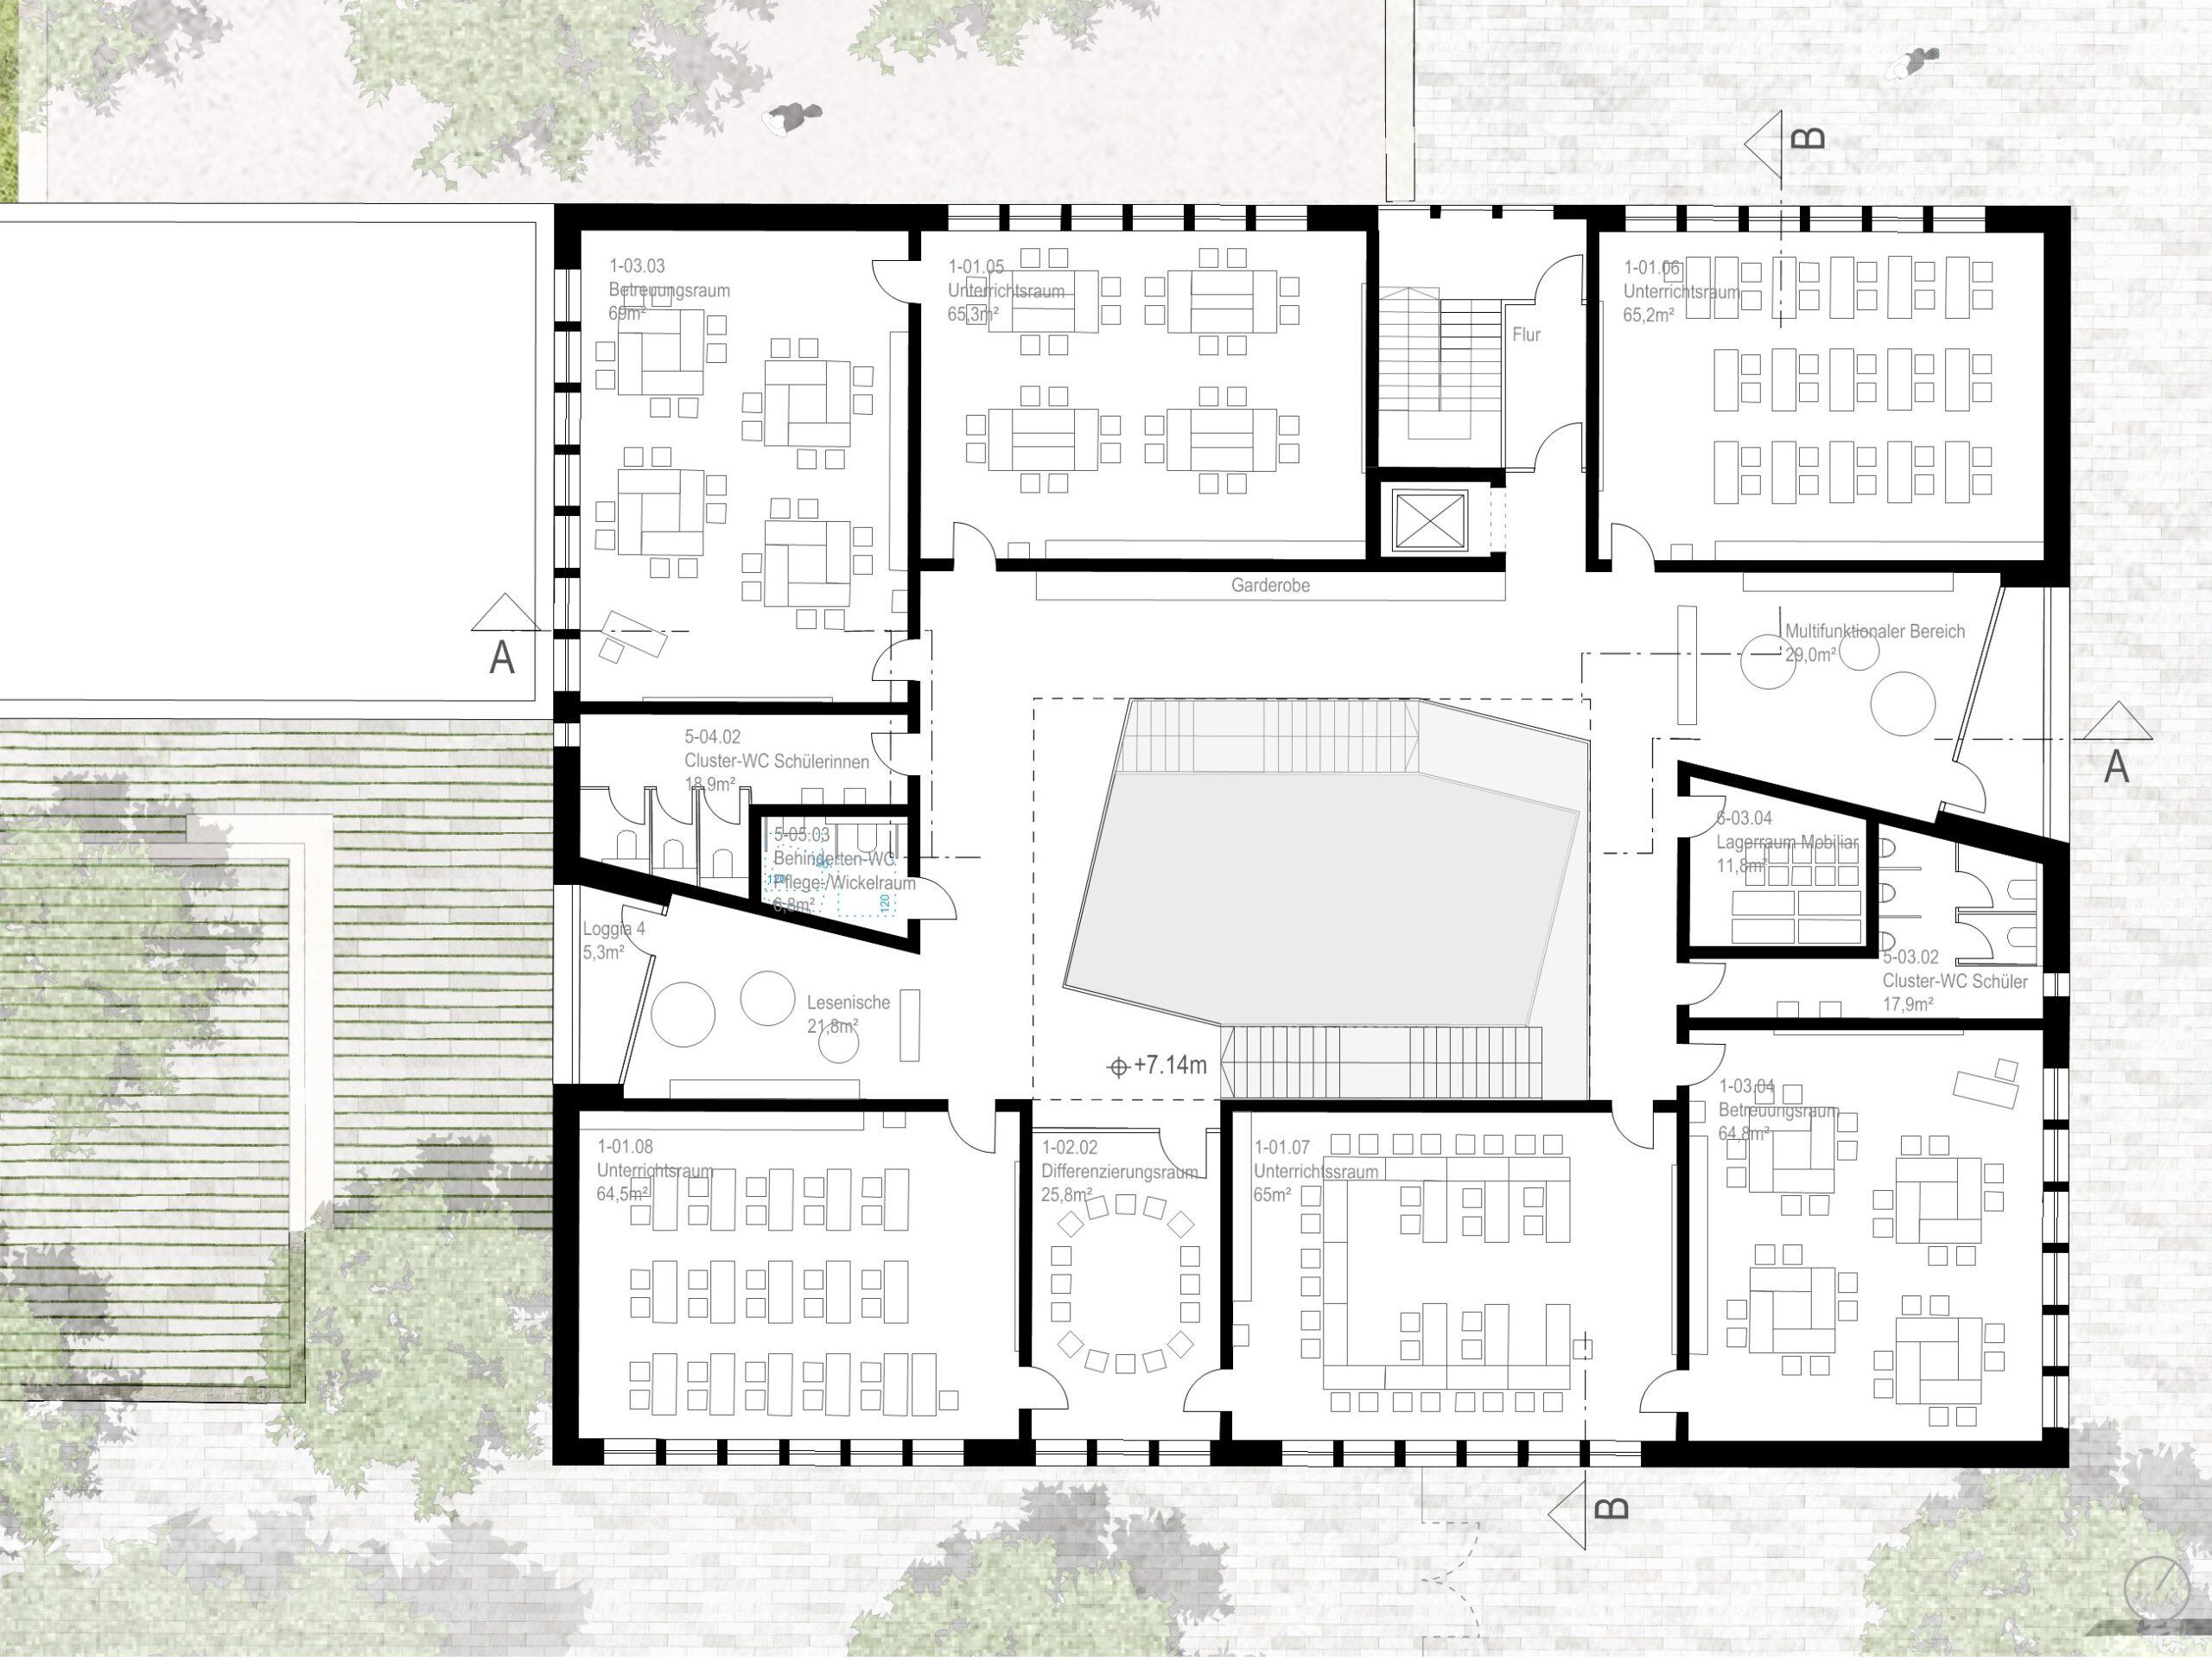 Grundriss 2. Obergeschoss Wettbewerb Grundschule Münster